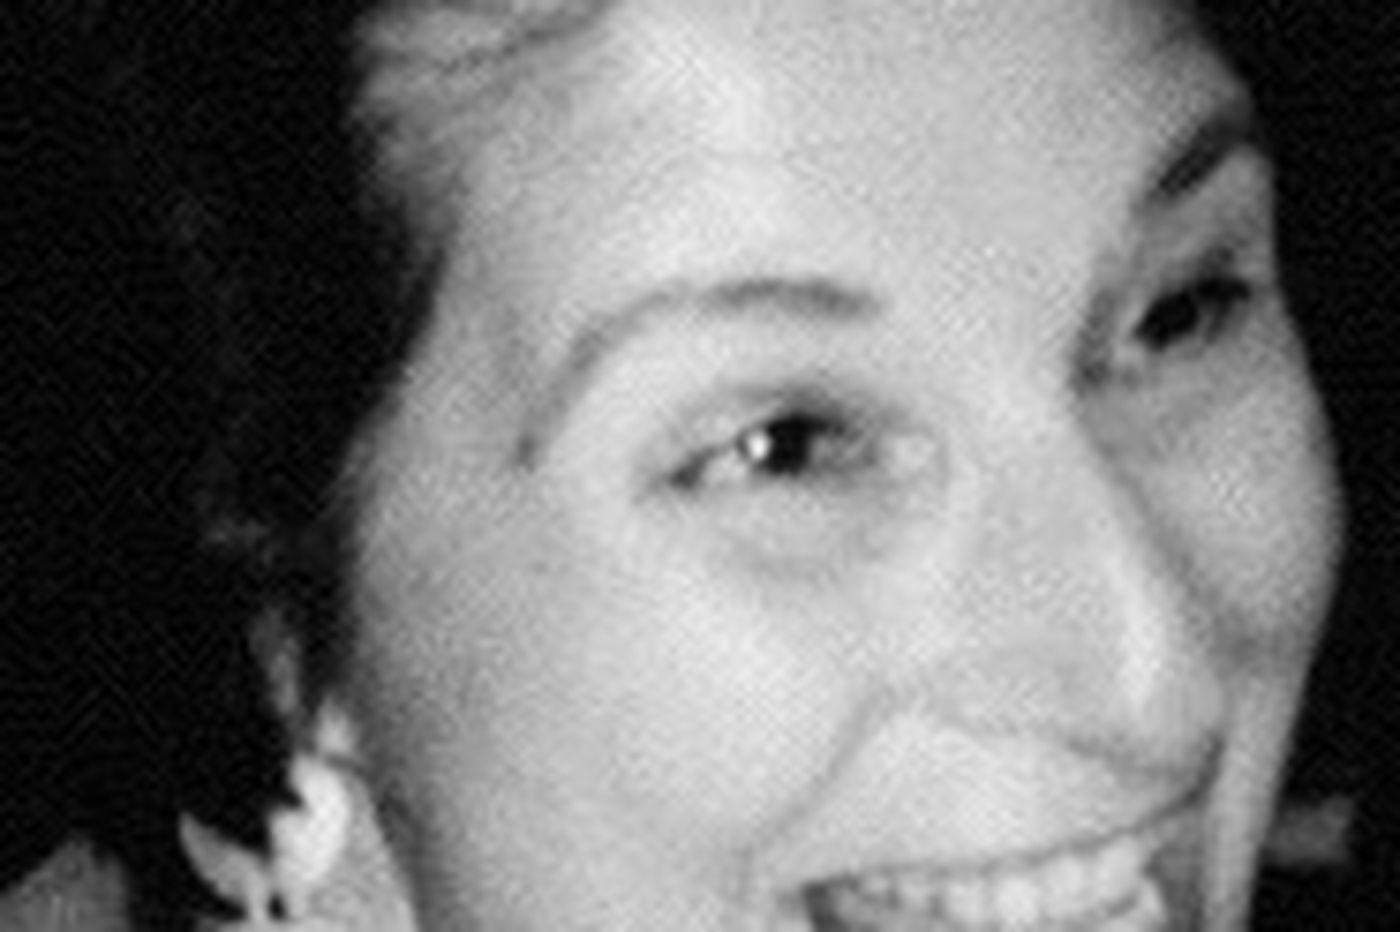 Phyllis R. Schlagman | Real estate developer, 68